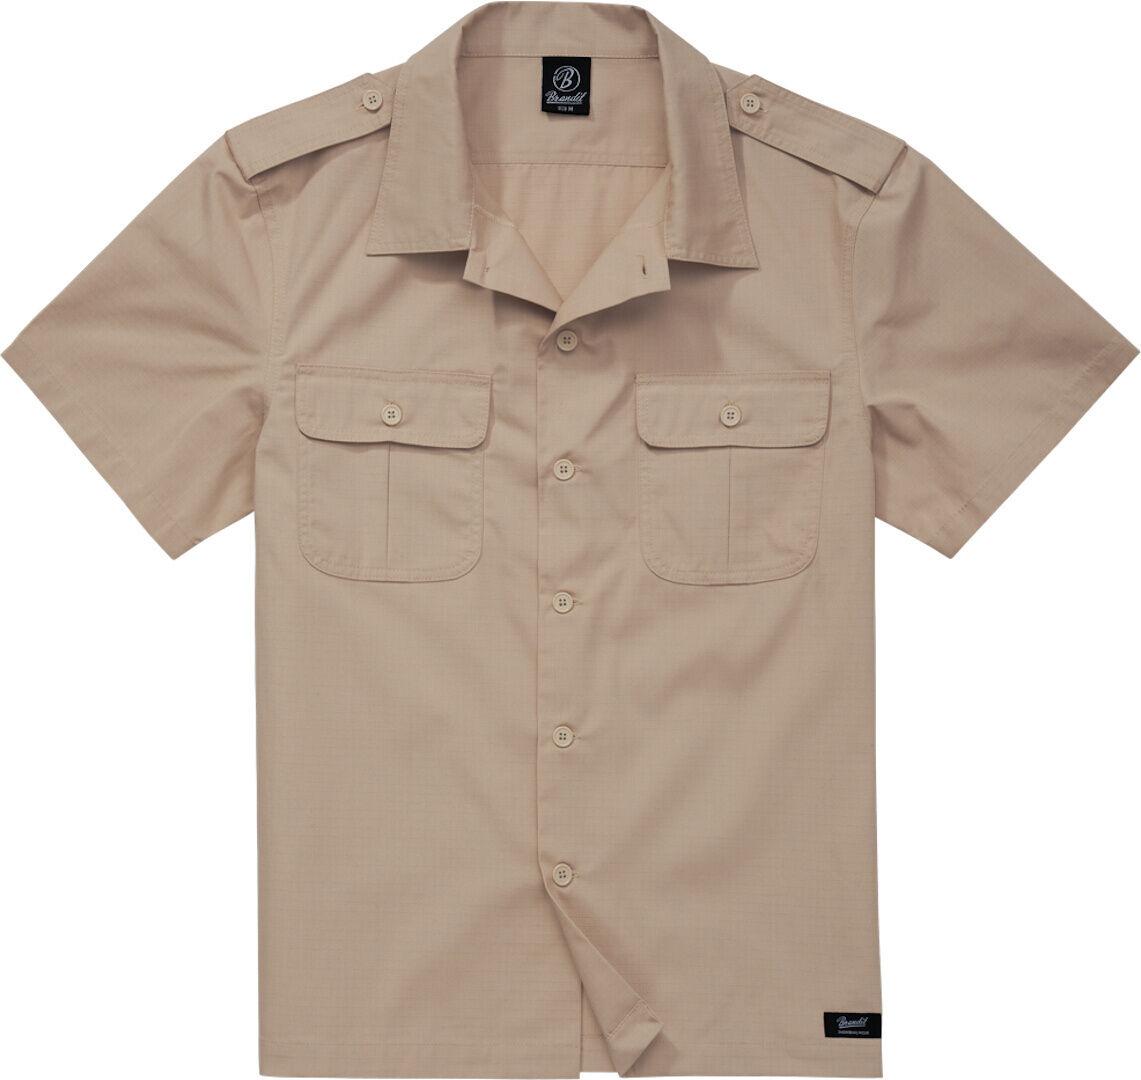 Brandit US Ripstop Paita  - Beige - Size: 2XL